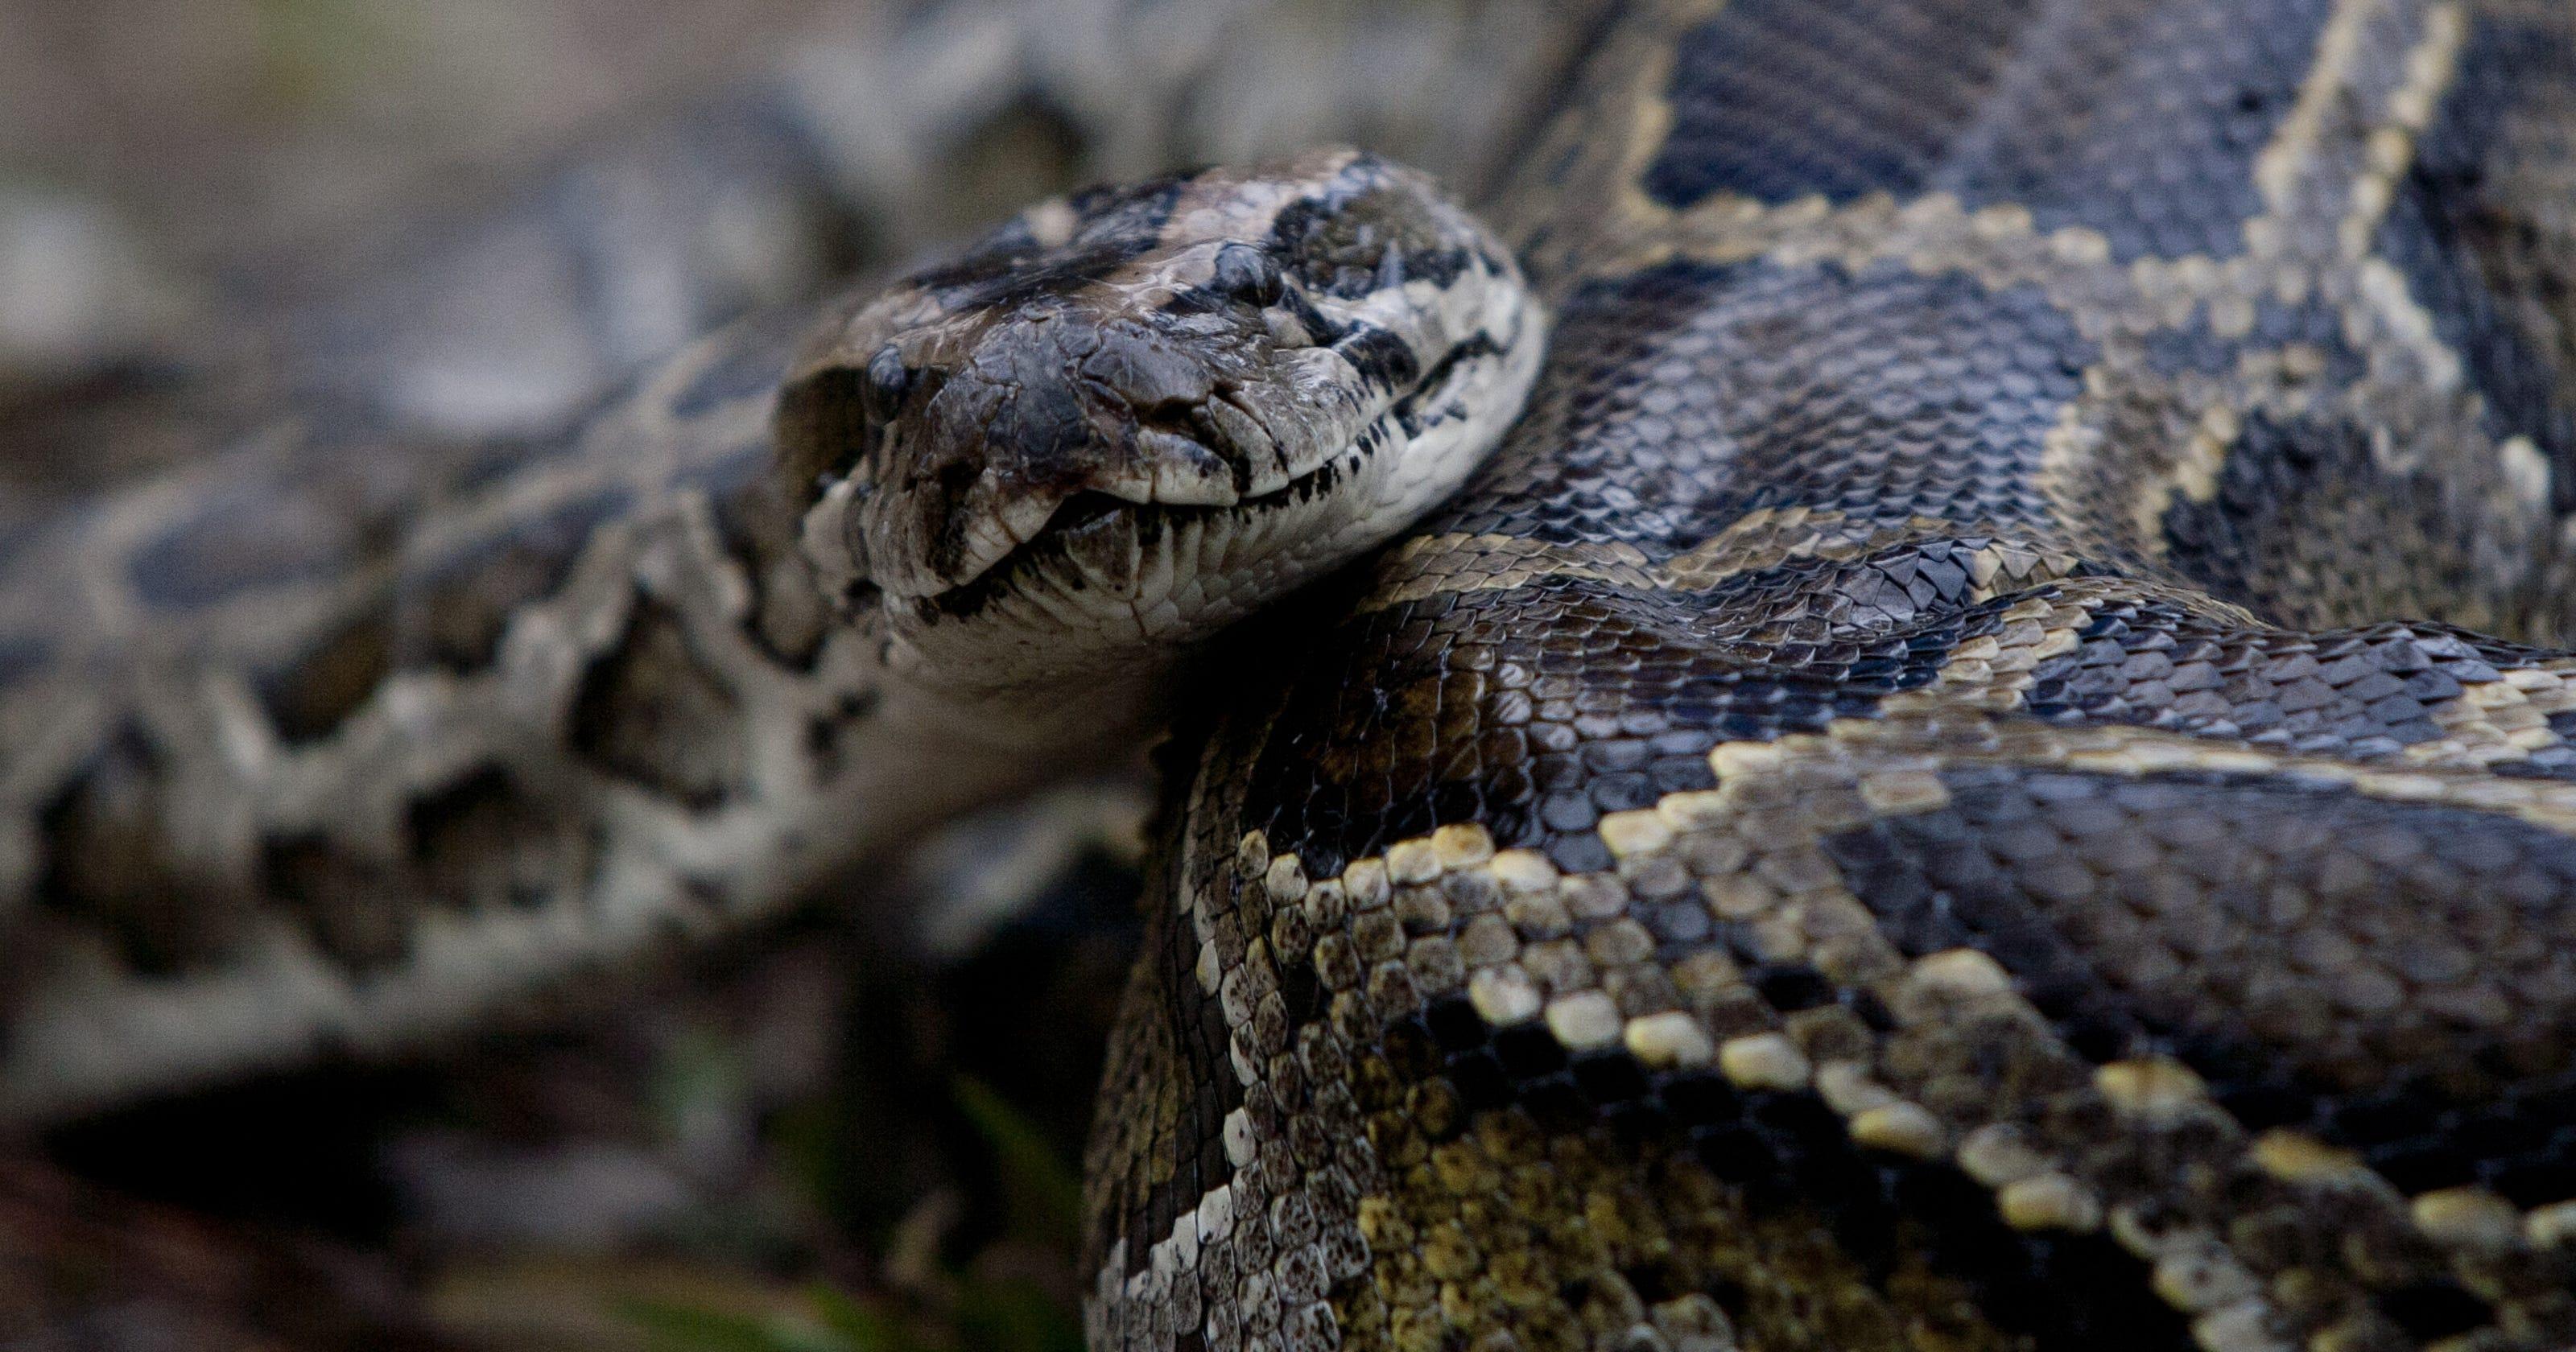 Everglades Python Hunt Draws Guns Knives Drills